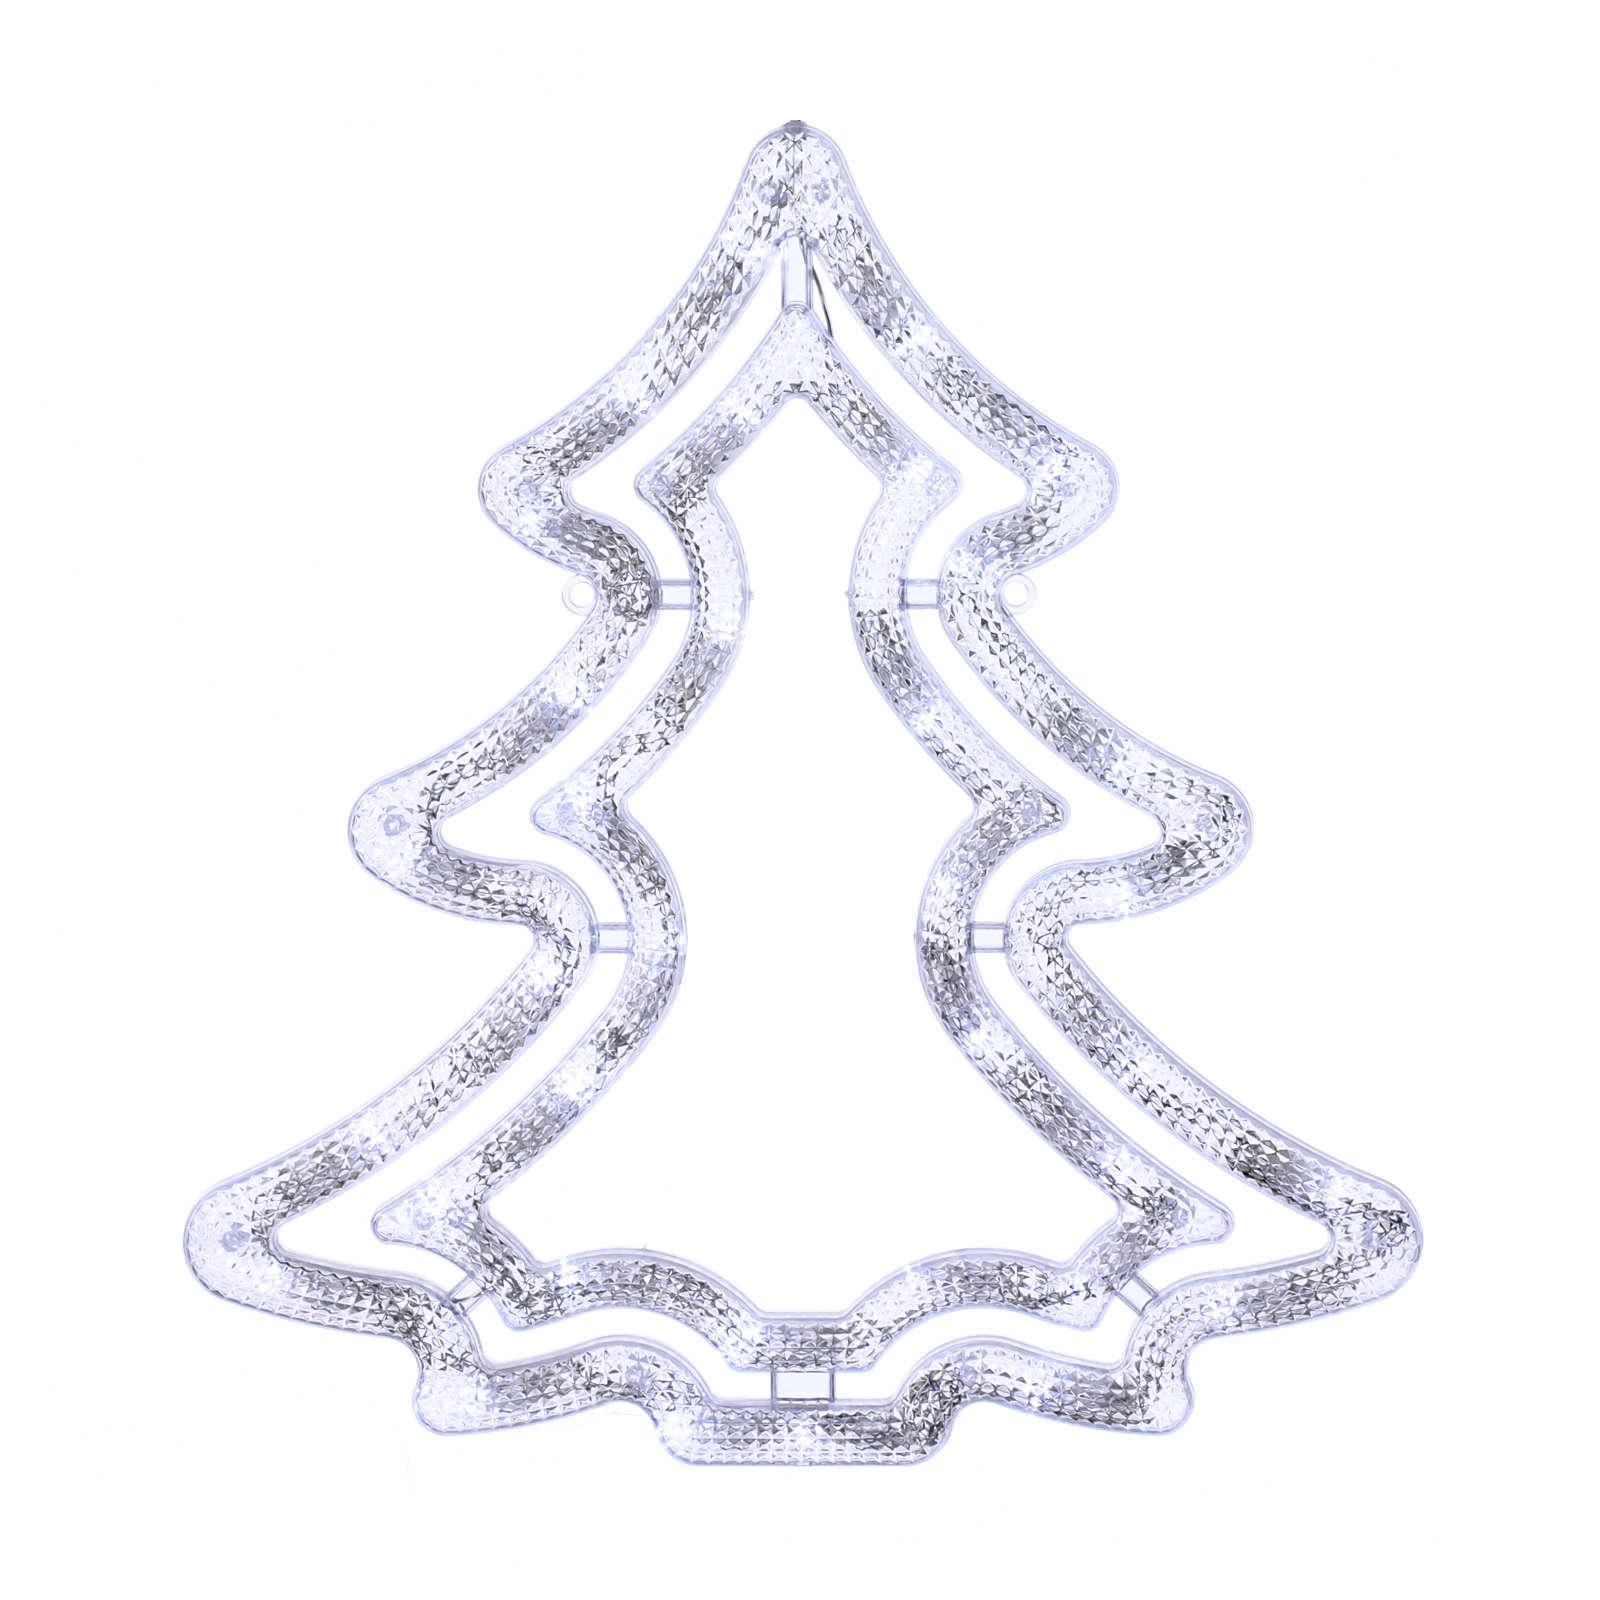 Árbol luminoso 35 led blanco hielo interior exterior 3